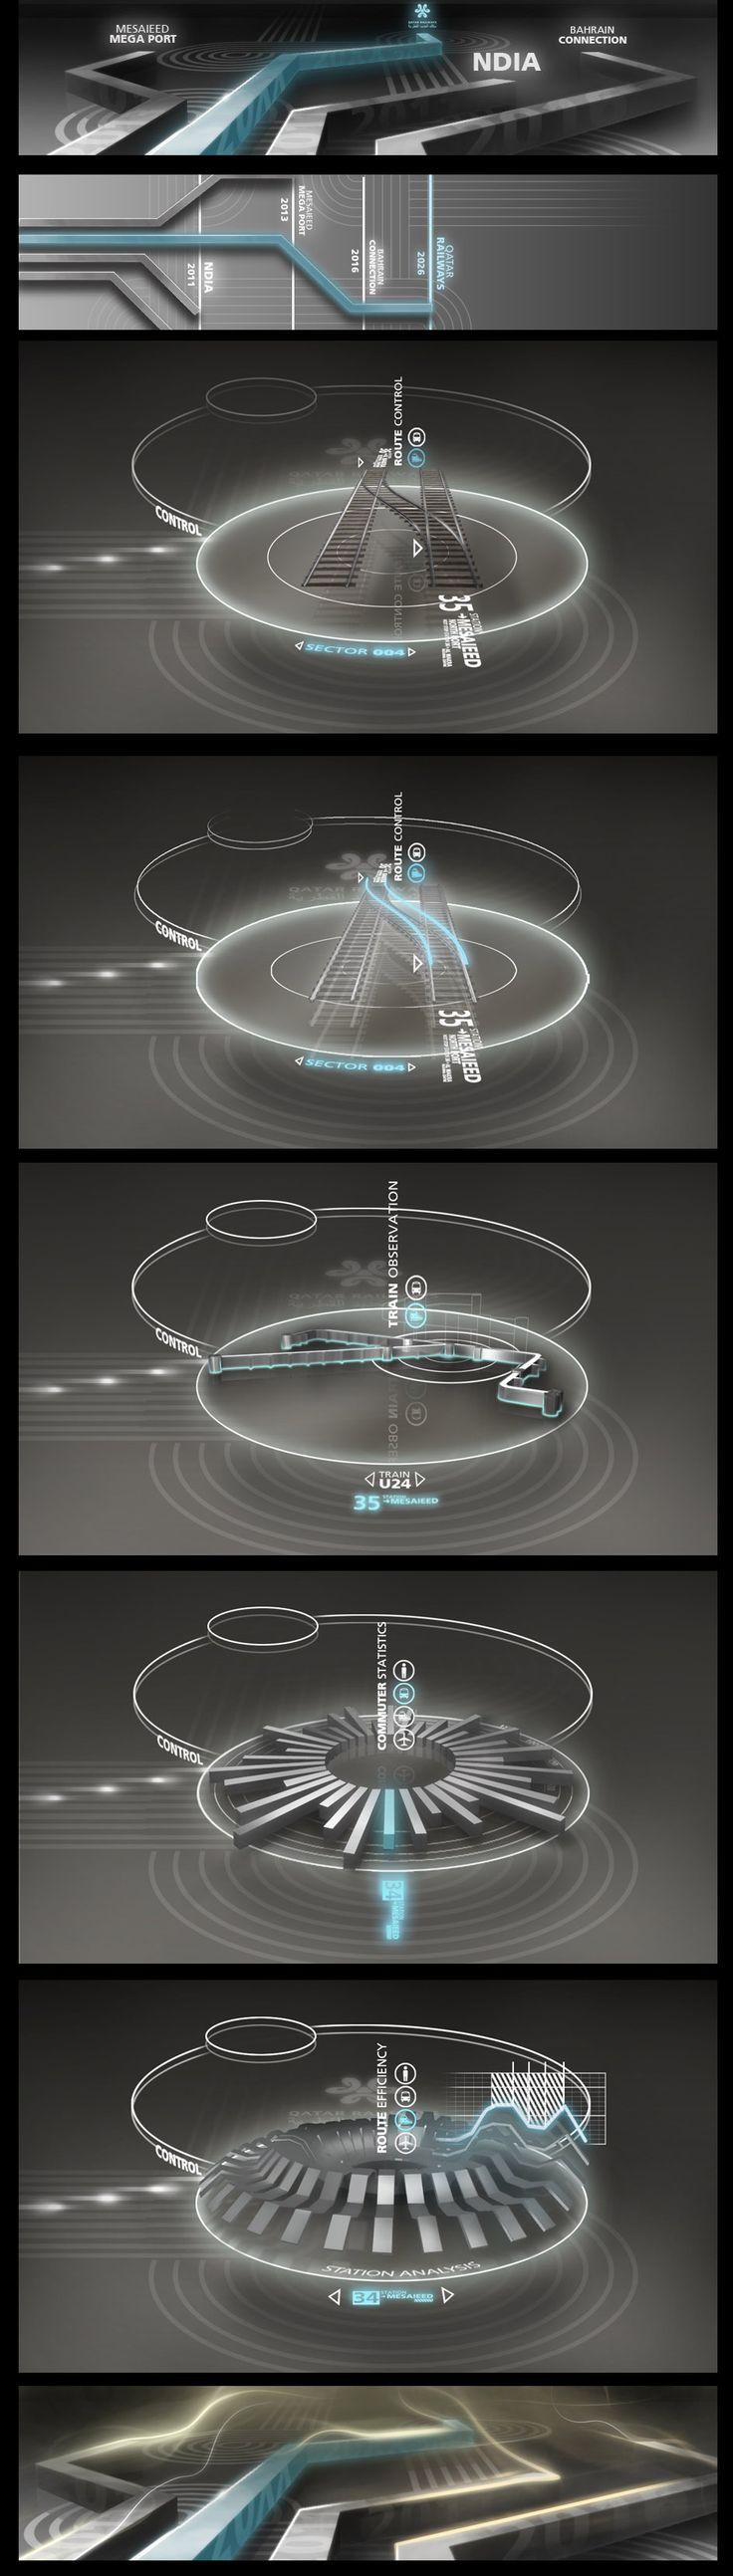 Touchscreen interface concept by stereolize-design.deviantart.com on @deviantART